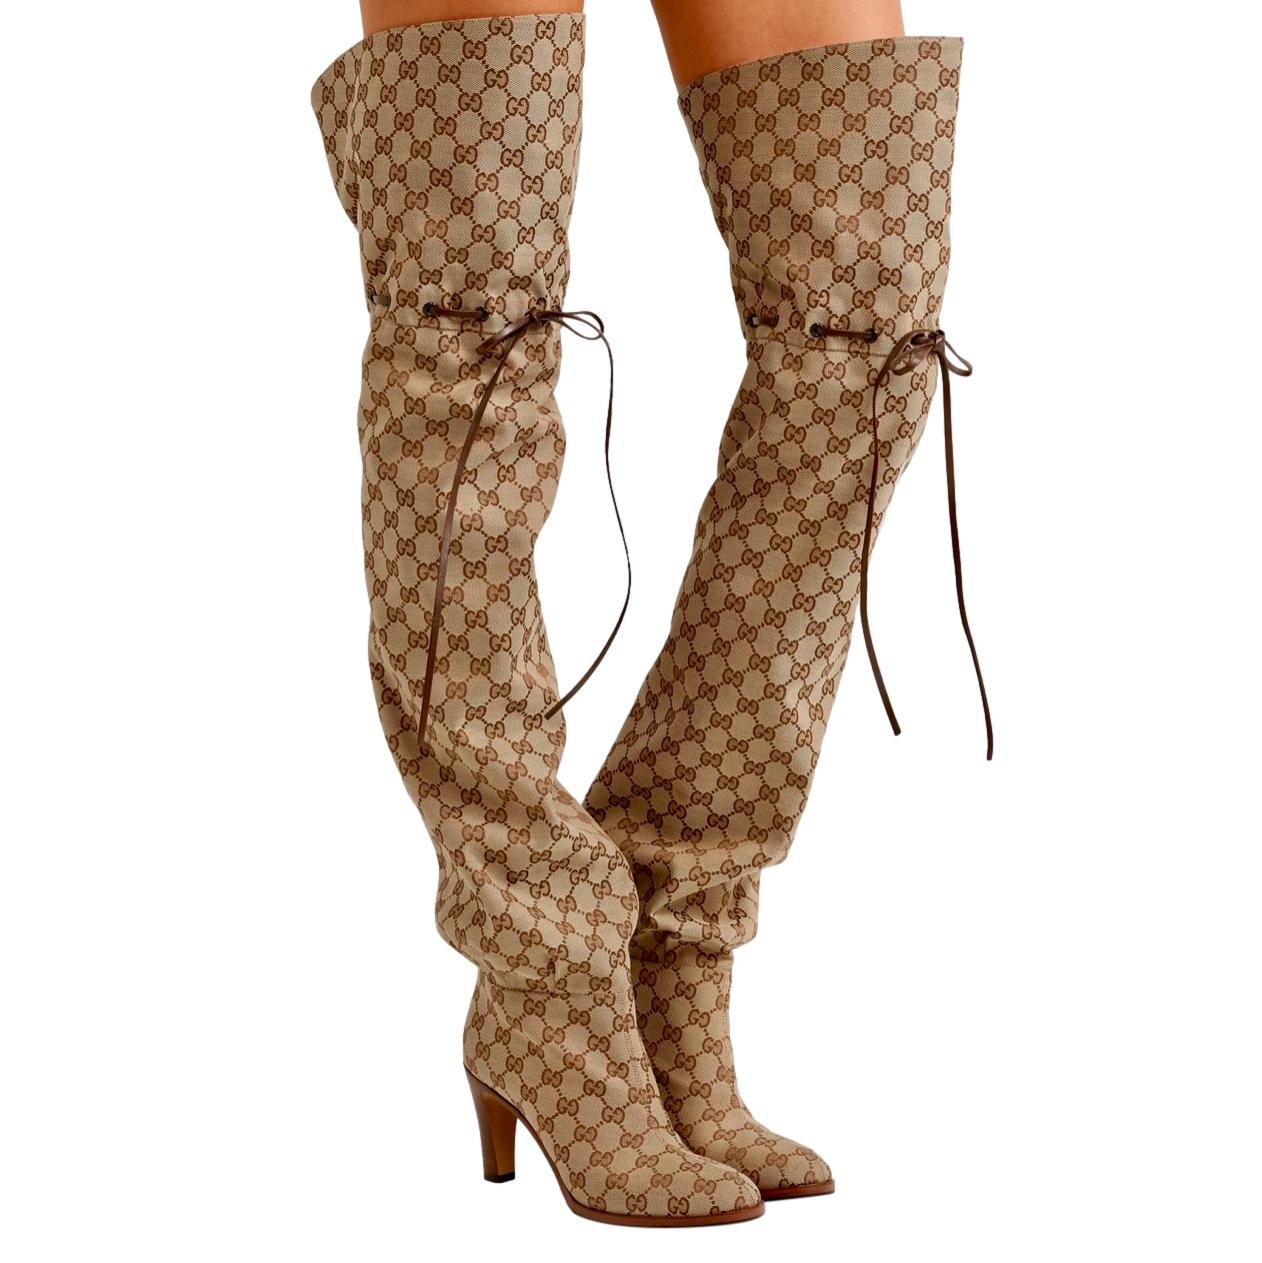 Gucci Monogram Jacquard Drawstring OTK Boots